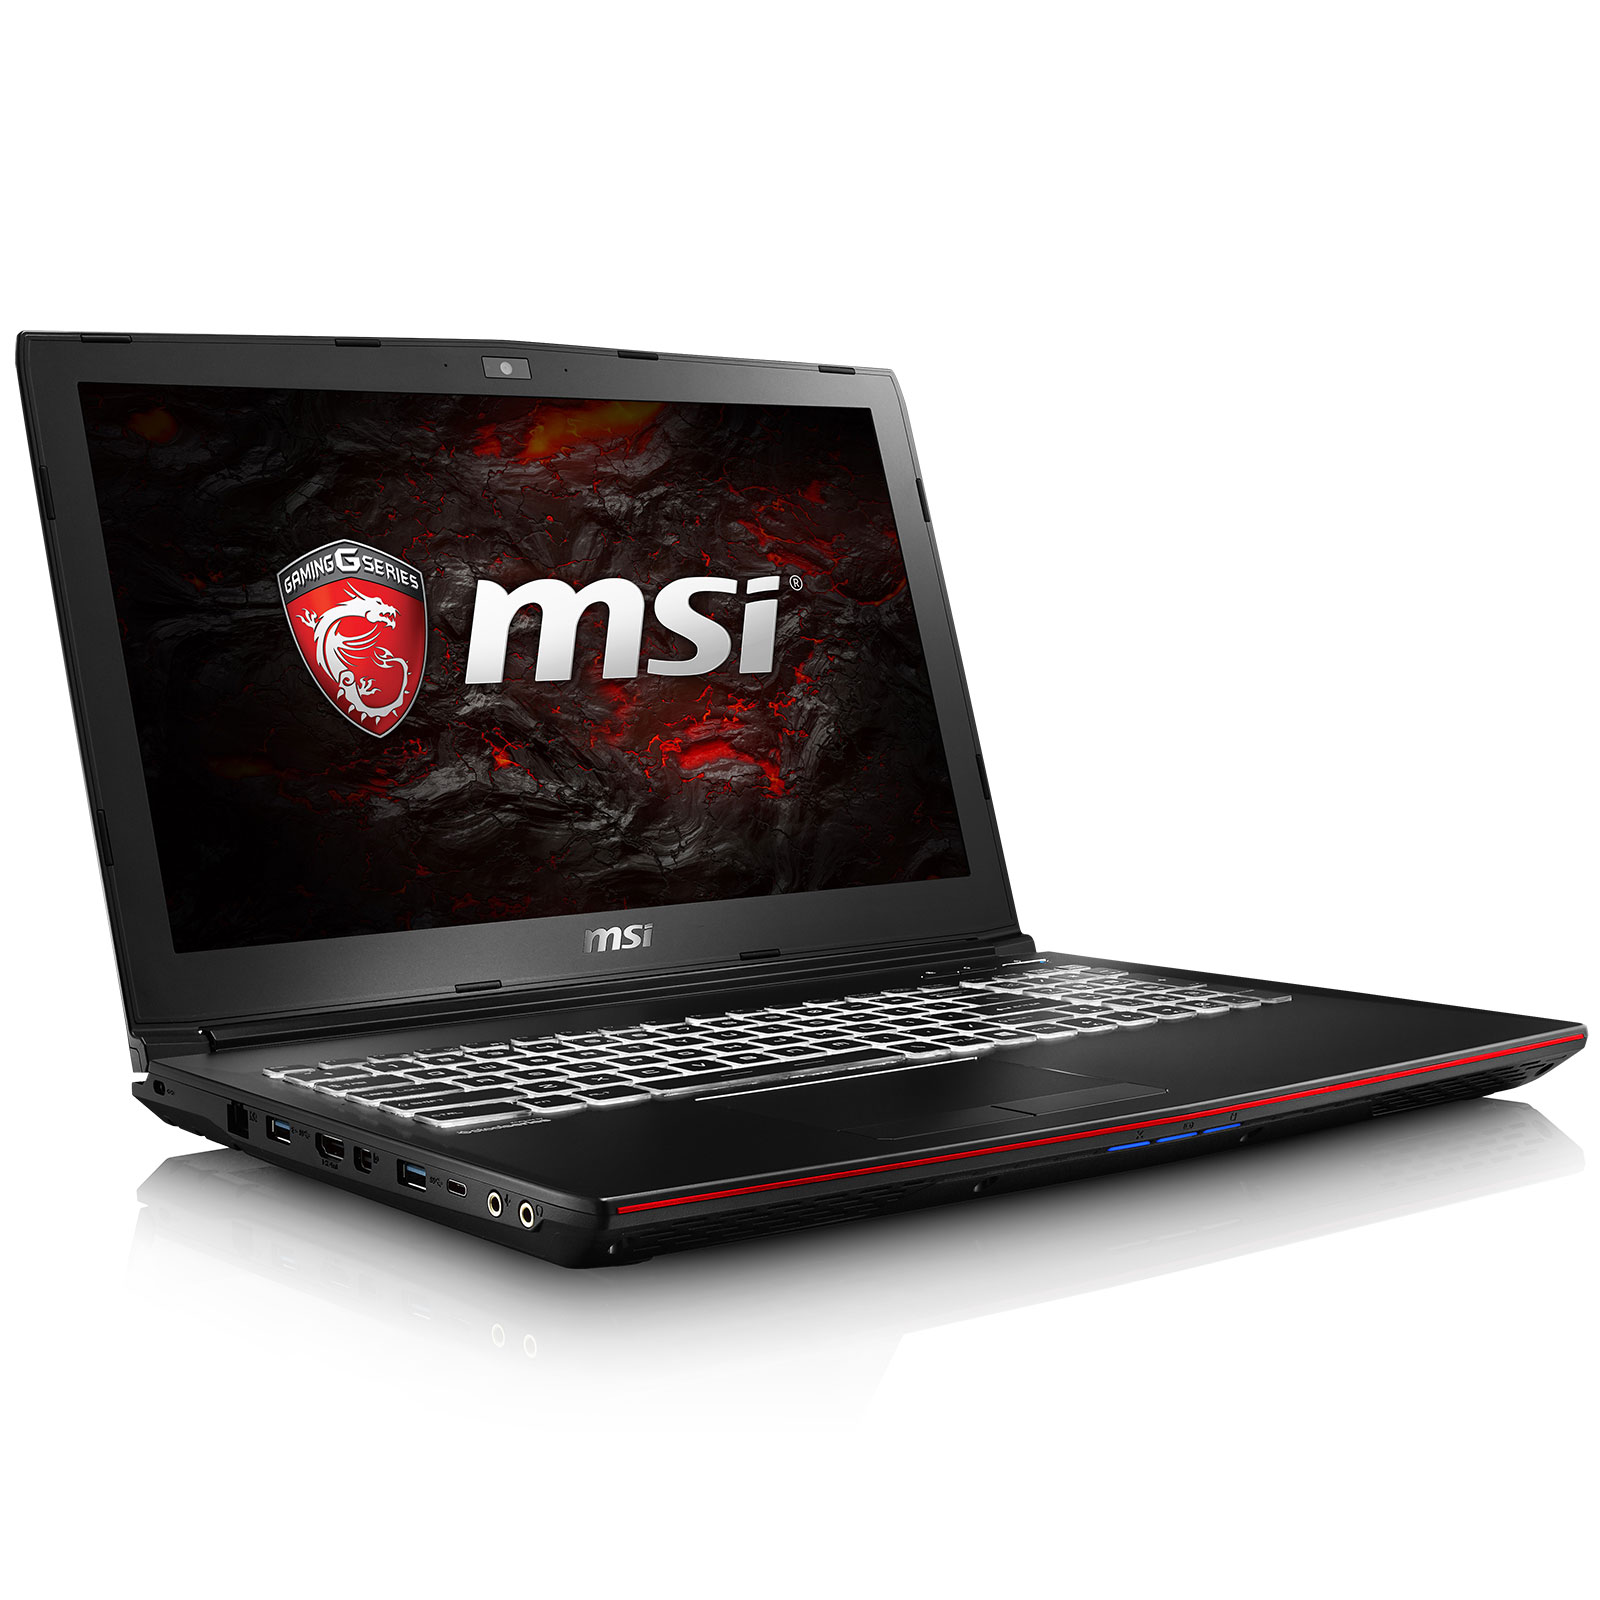 "PC portable MSI GP62 6QF-1478FR Intel Core i7-6700HQ 8 Go SSD 128 Go + HDD 1 To 15.6"" LED Full HD NVIDIA GeForce GTX 960M 2 Go Graveur DVD Wi-Fi AC/Bluetooth Webcam Windows 10 Famille 64 bits (garantie constructeur 2 ans)"